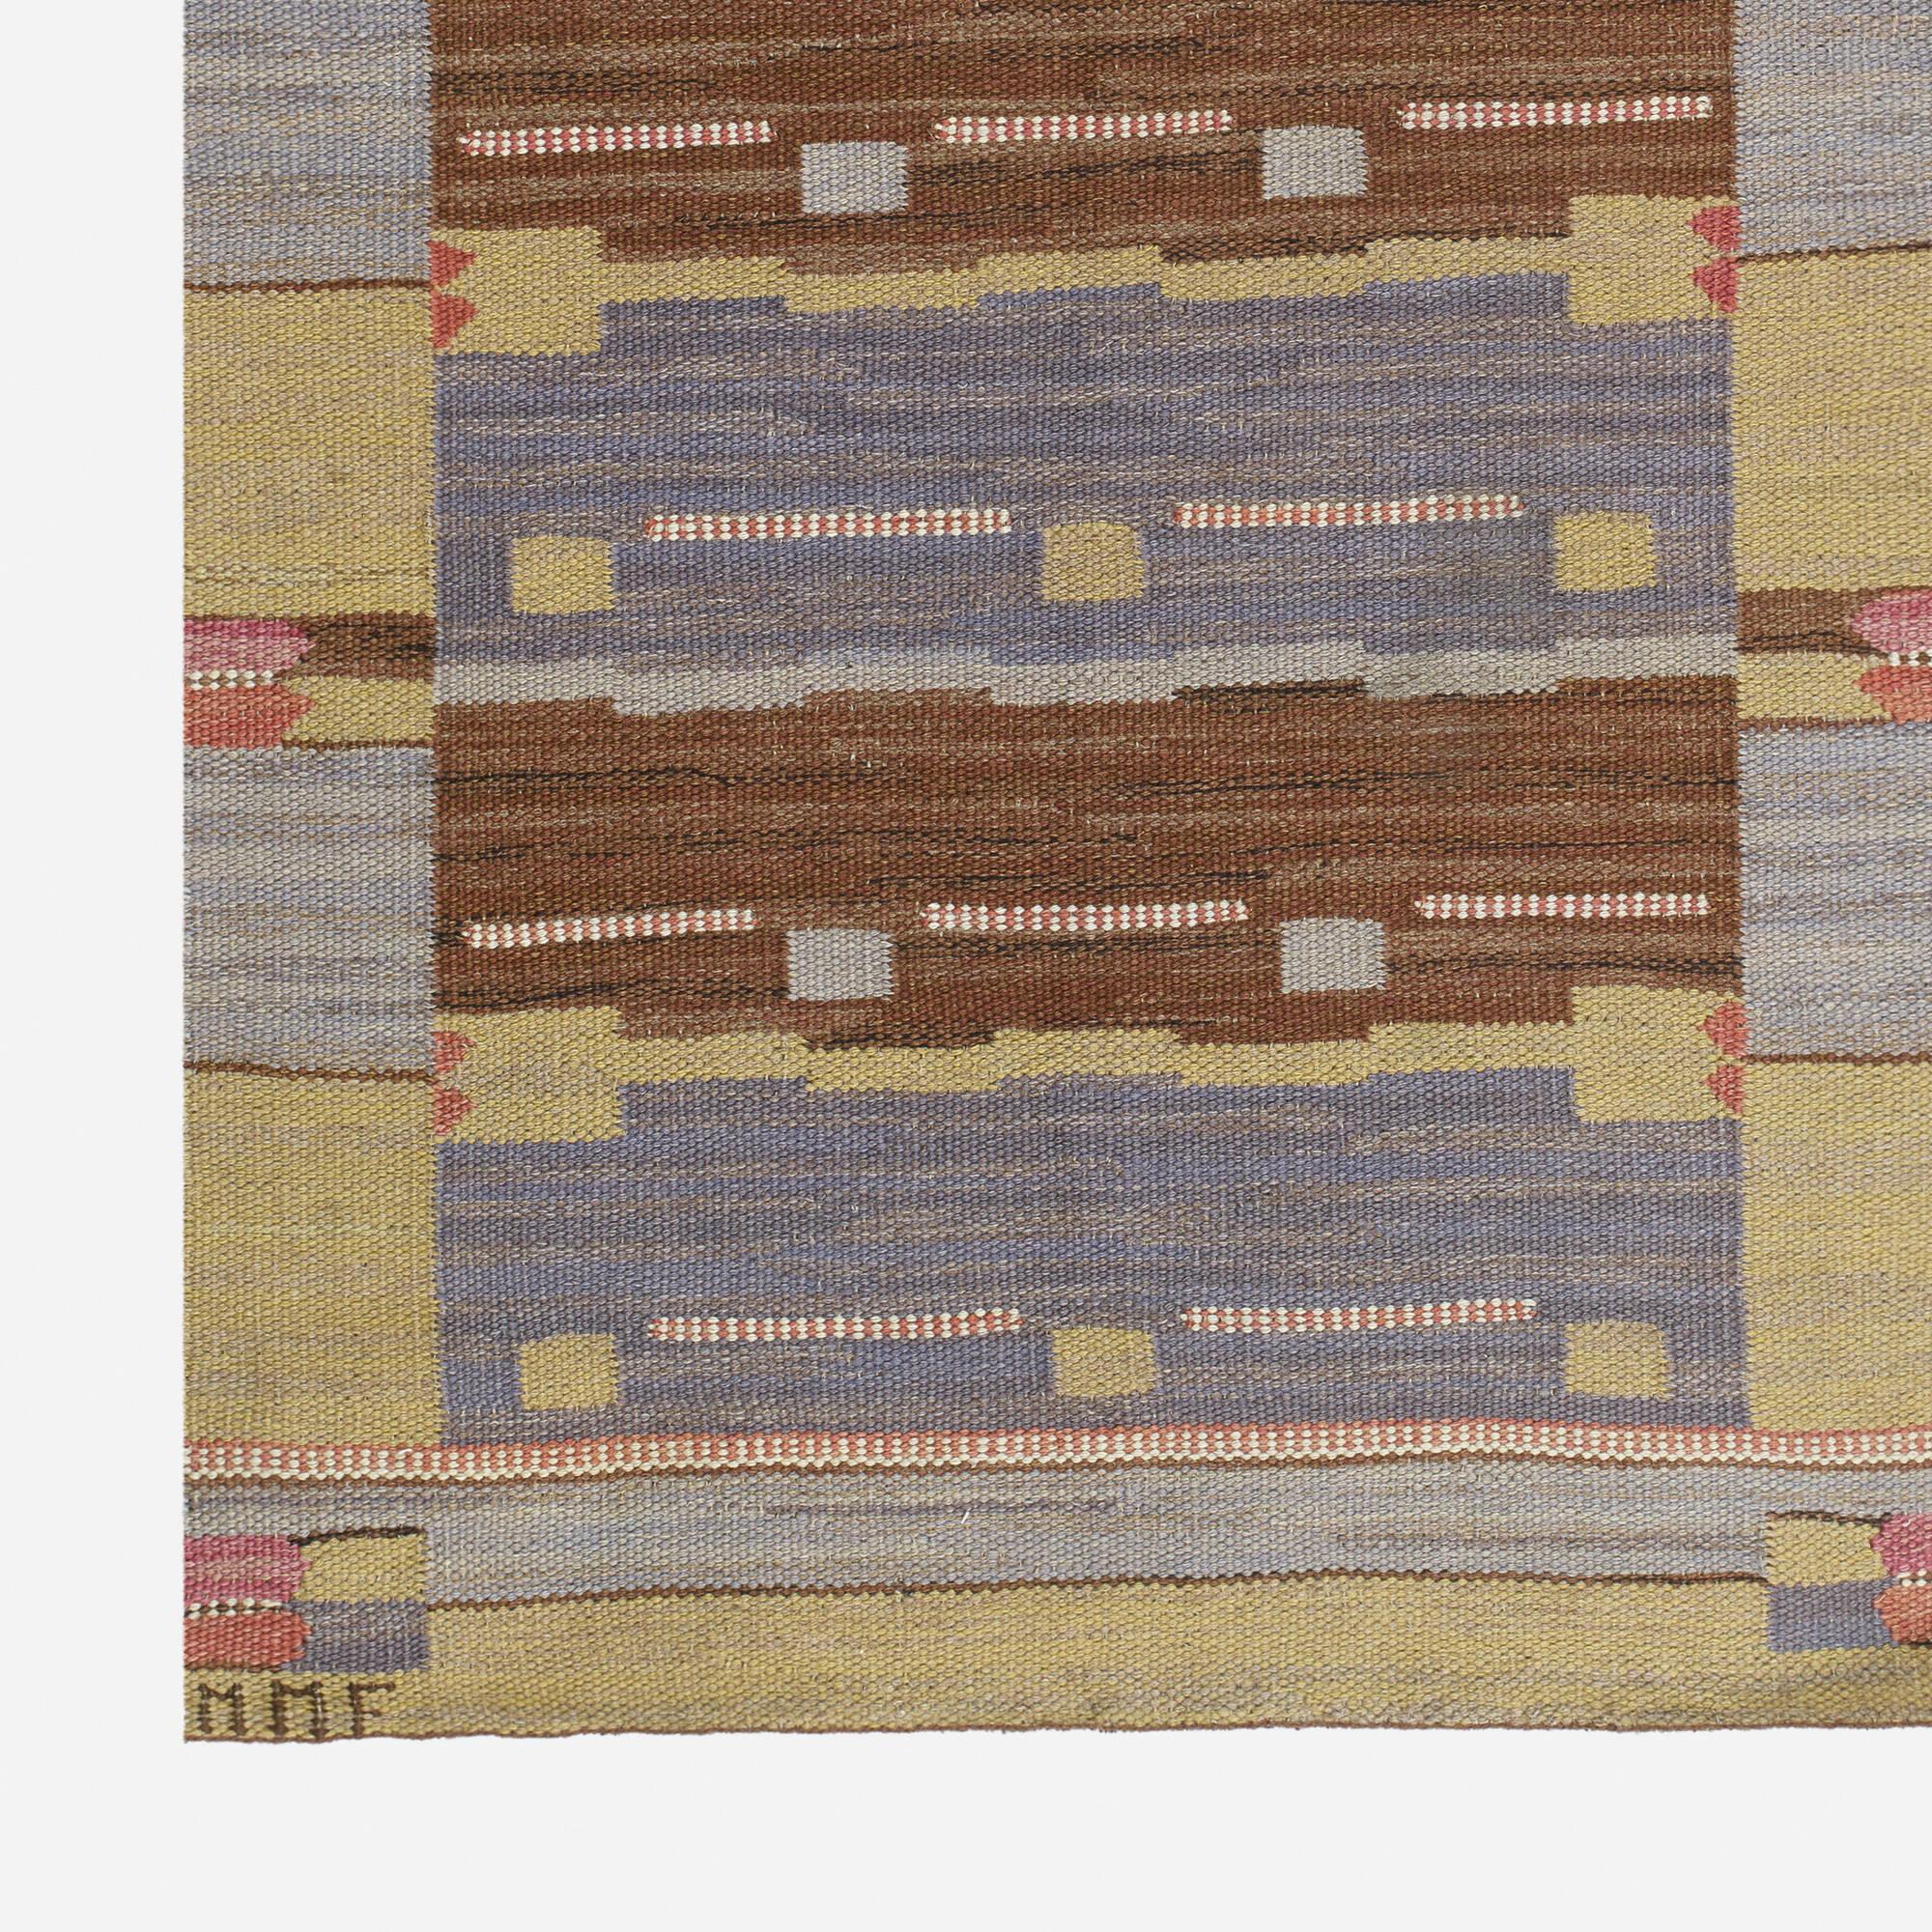 176: Märta Måås-Fjetterström / Blåsvarten flatweave carpet (2 of 2)